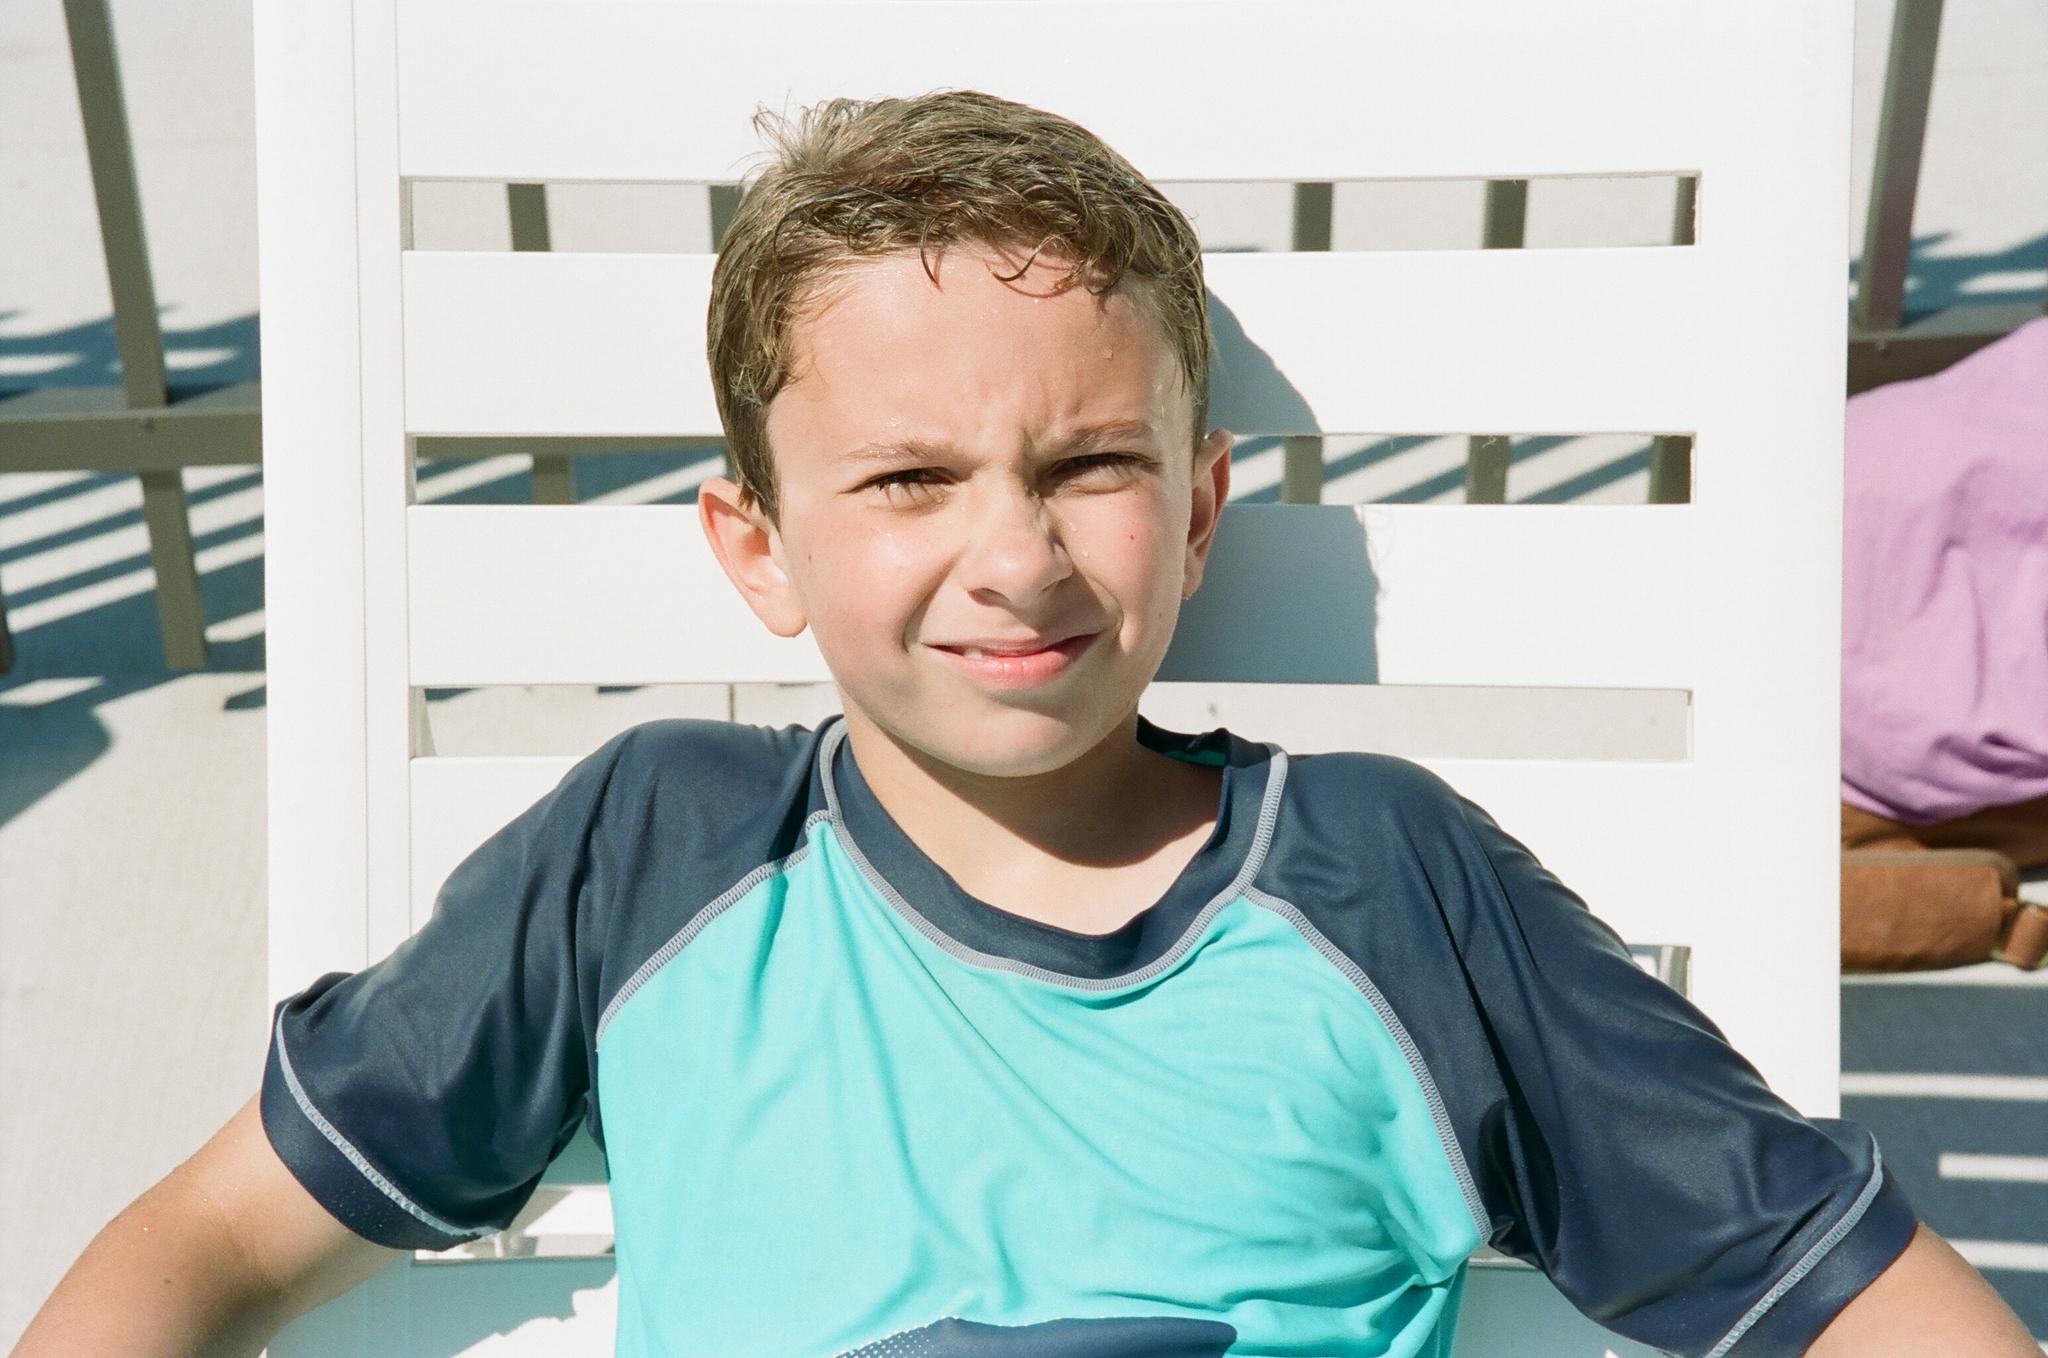 Portrait at pool of boy